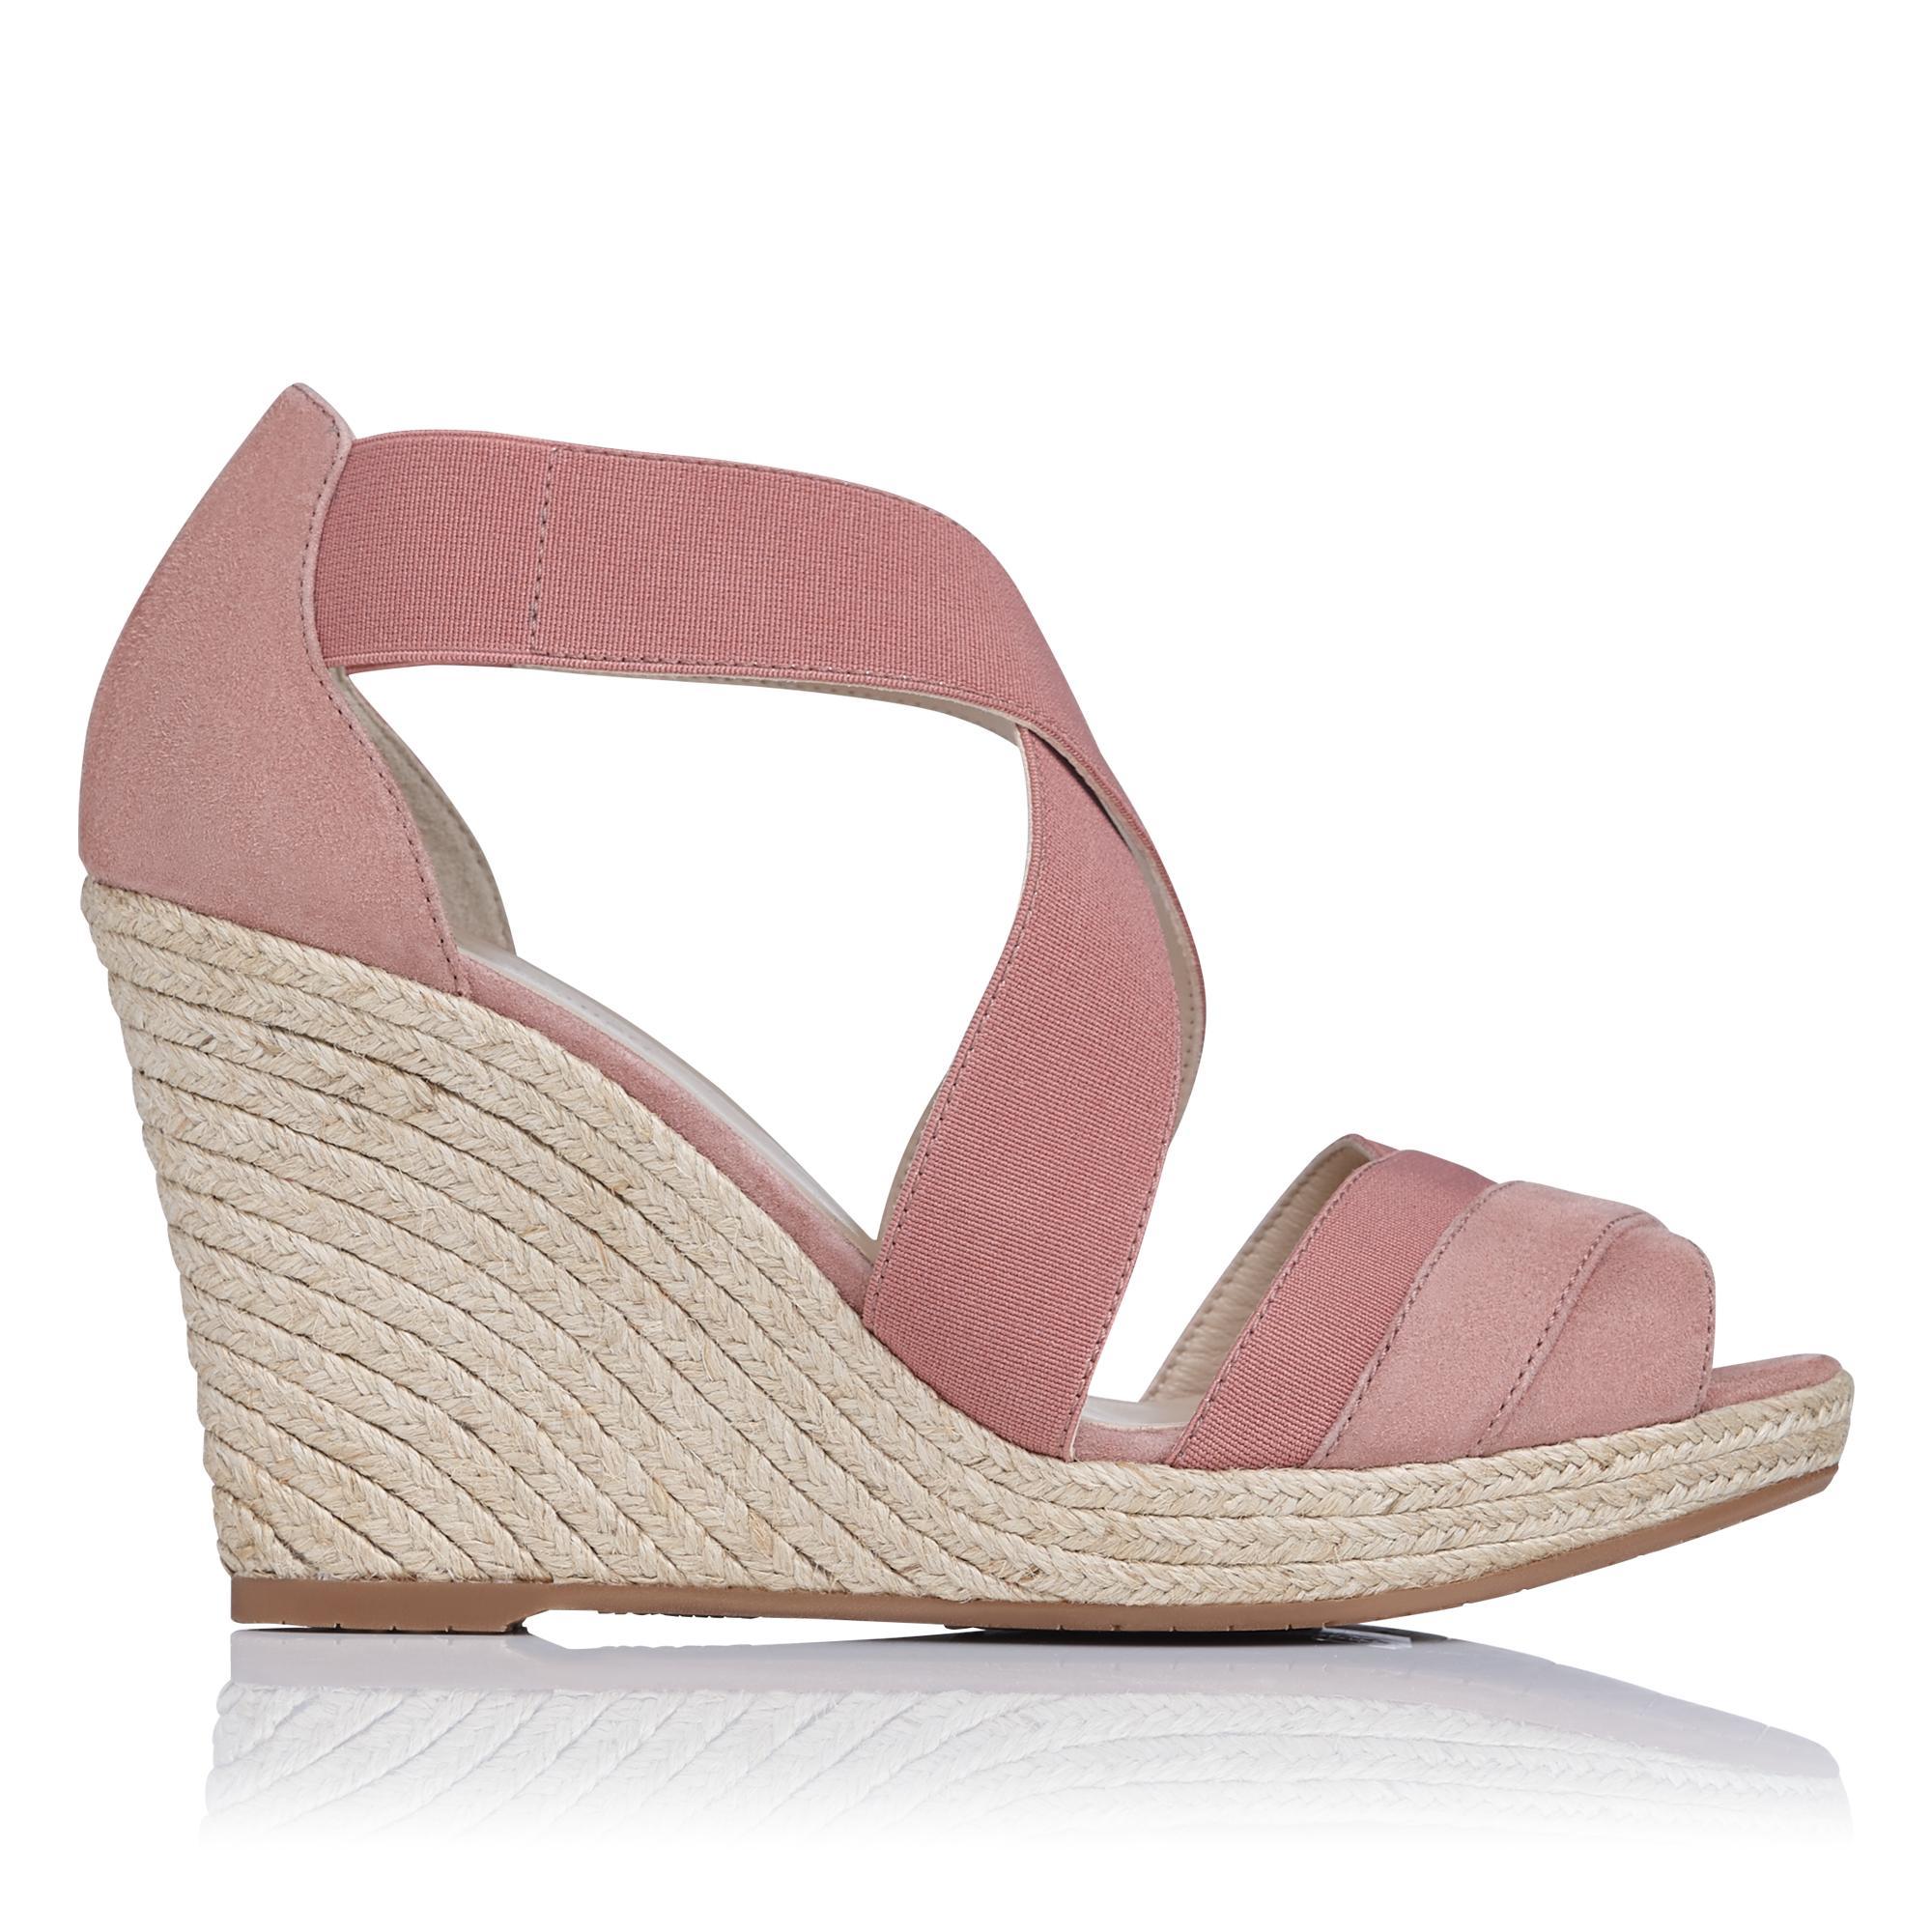 Alycia Pink Espadrille Wedge